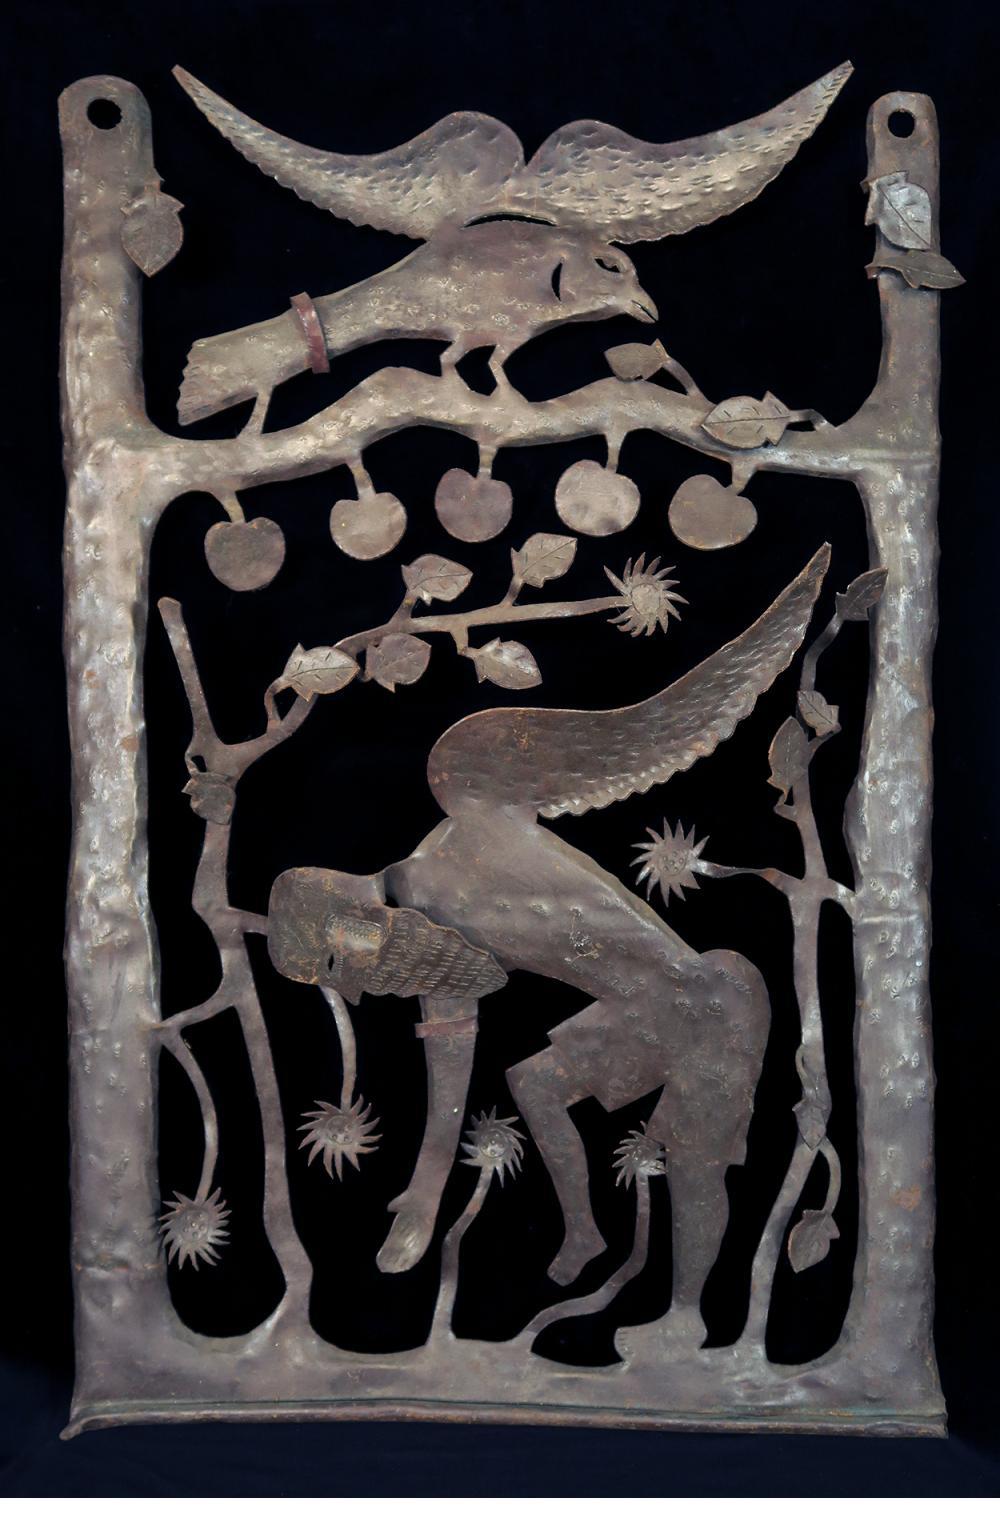 The Angel and the Bird - Gabriel Bien-Aimé